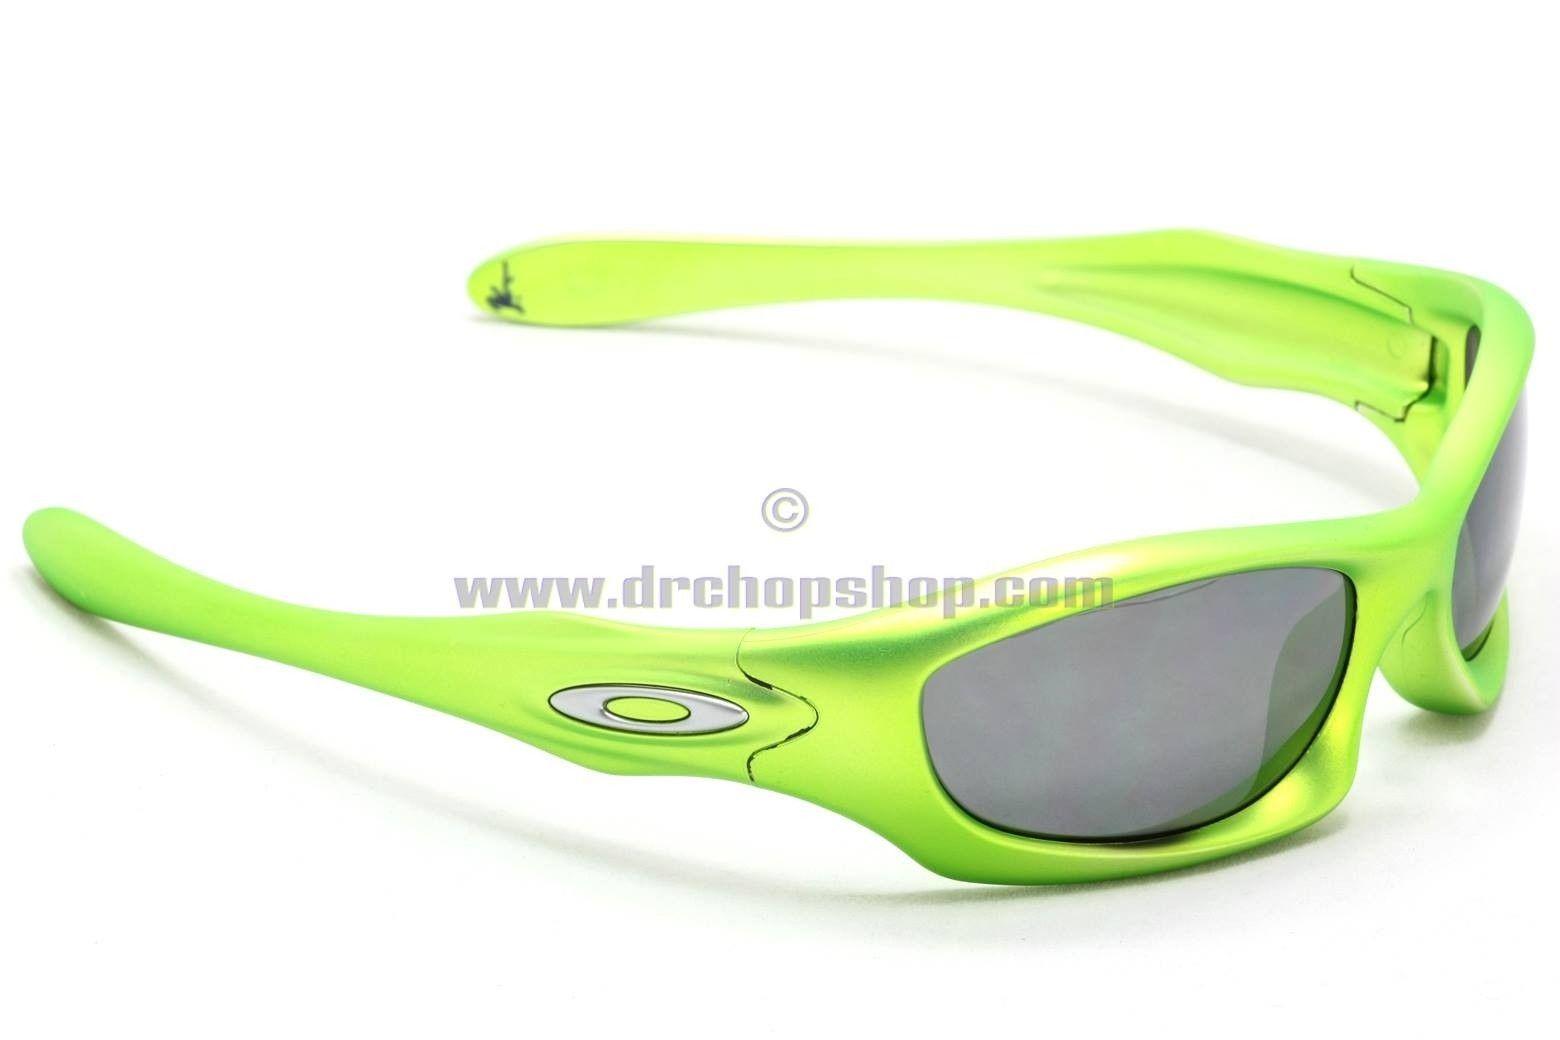 Couple Of Cool Customs - 798230_660748380603518_1333297565_o.jpg